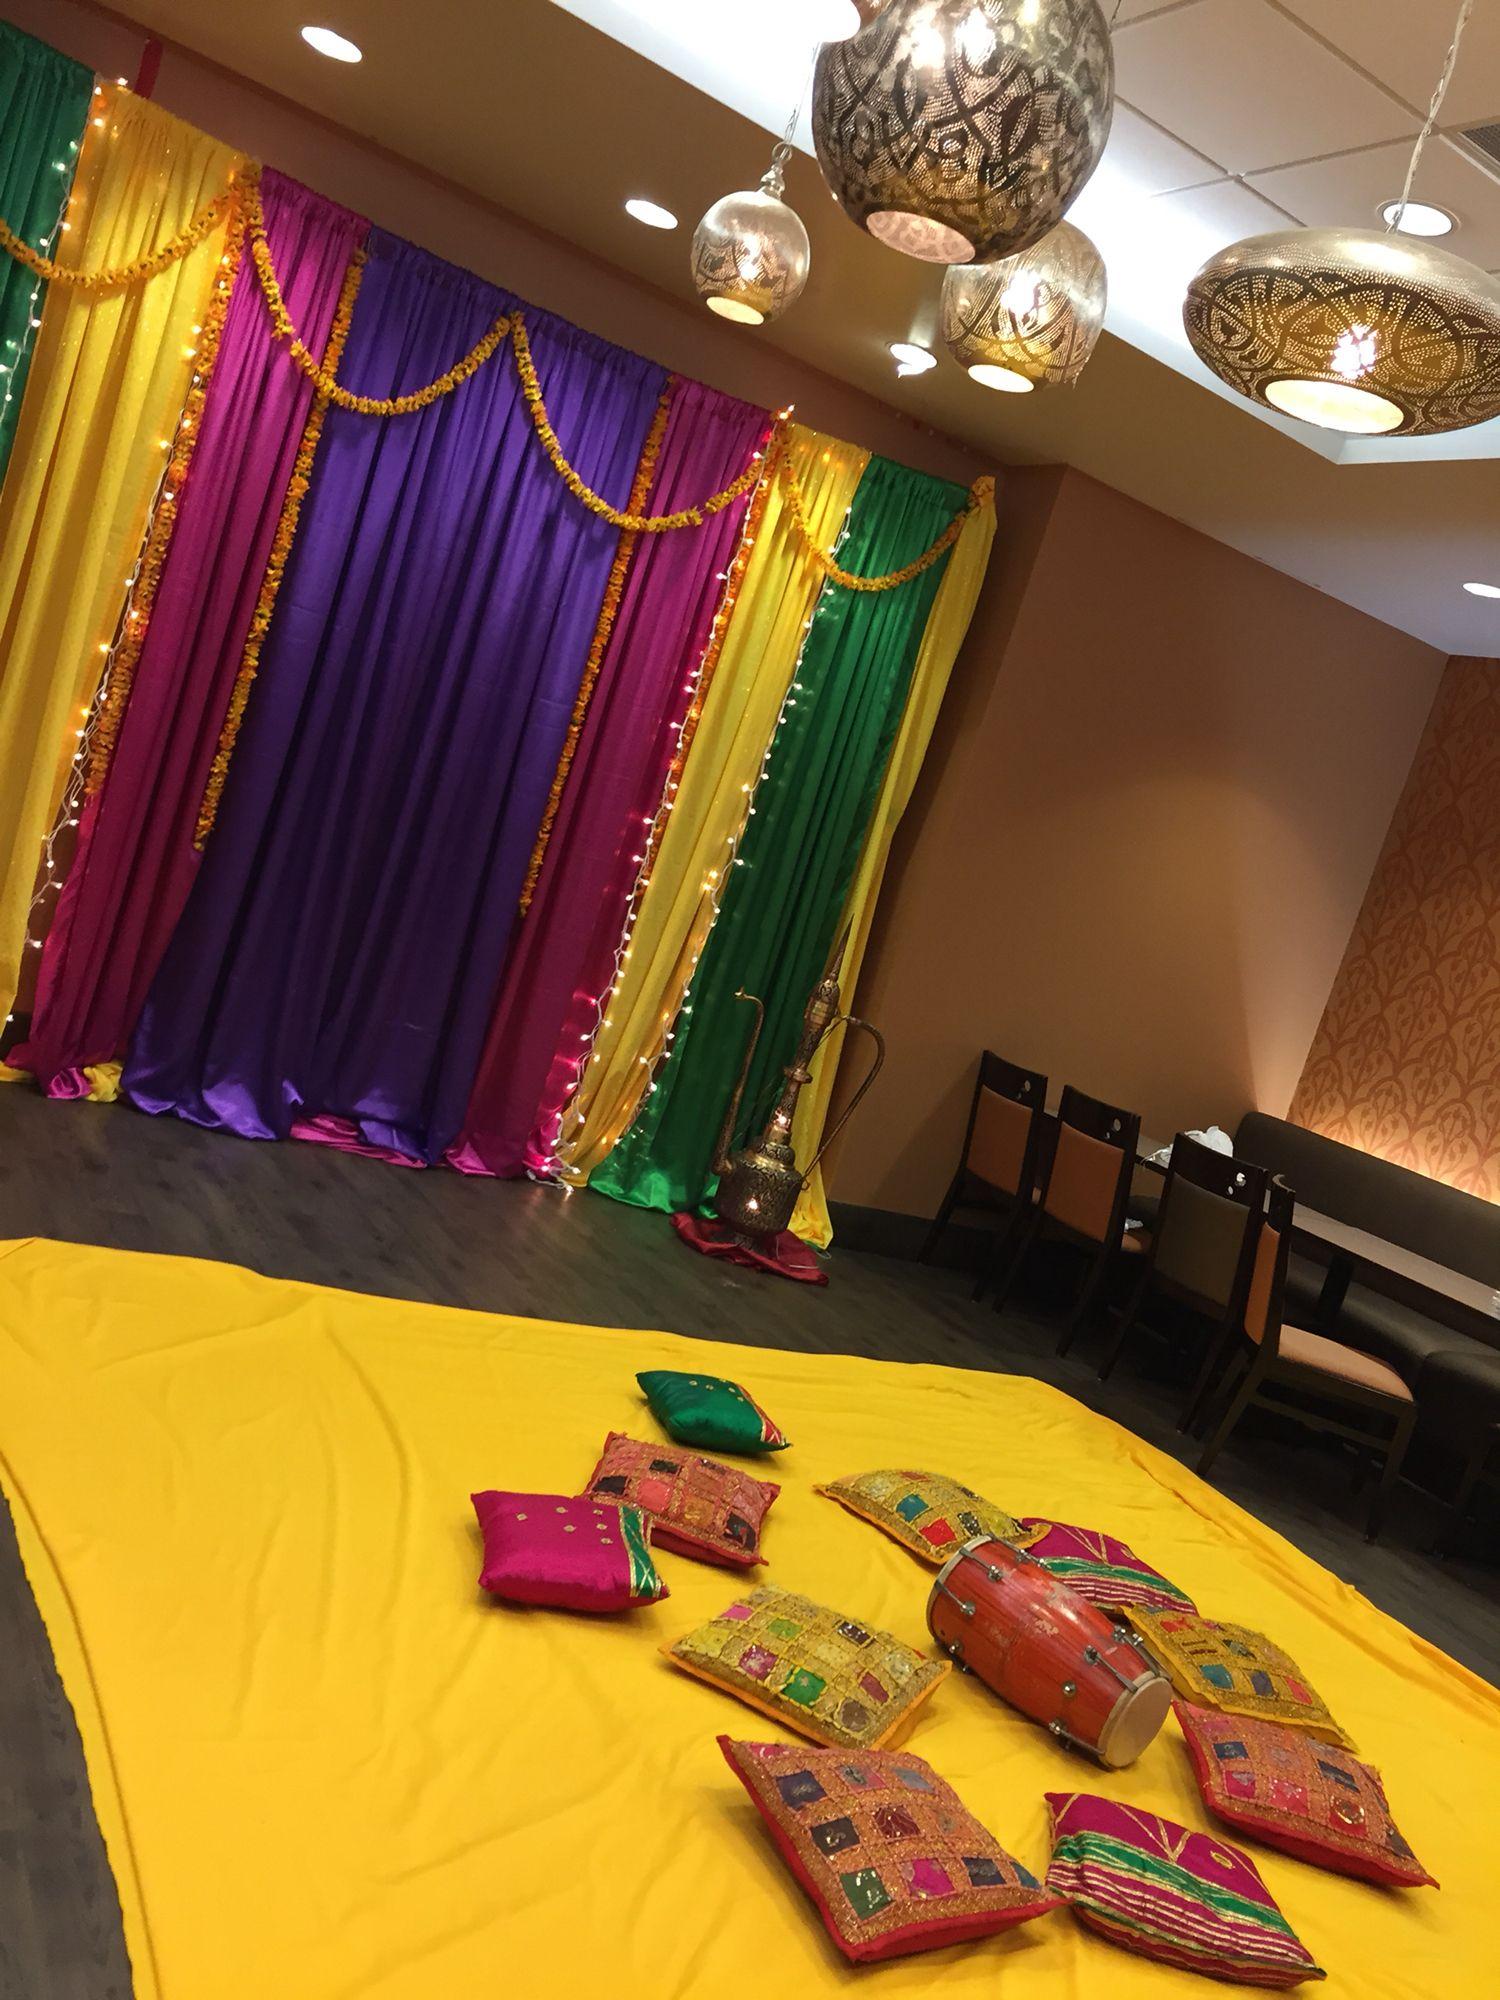 Wedding stage decor ideas  Henna decor Dholki night Pakistani henna night Sanger decor Soniaus